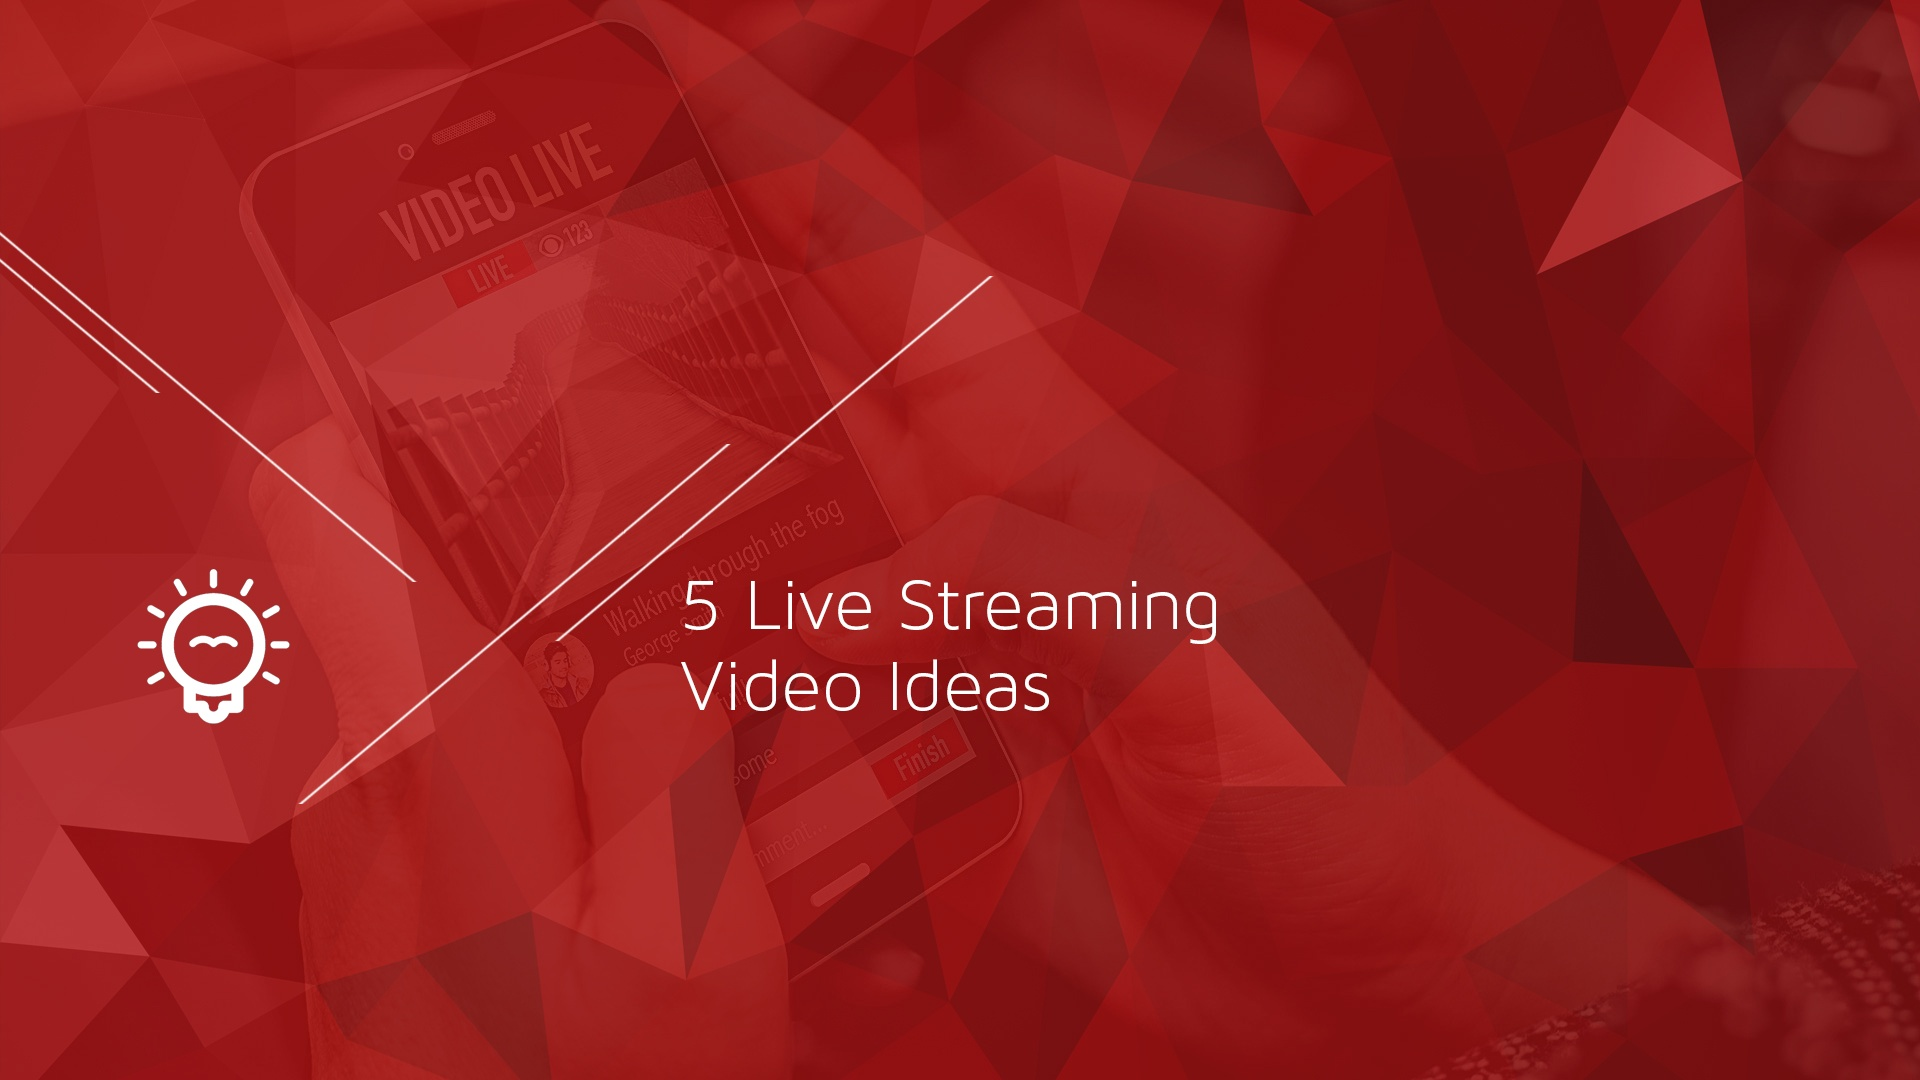 1---5-Live-Streaming-Video-Ideas-1.jpg